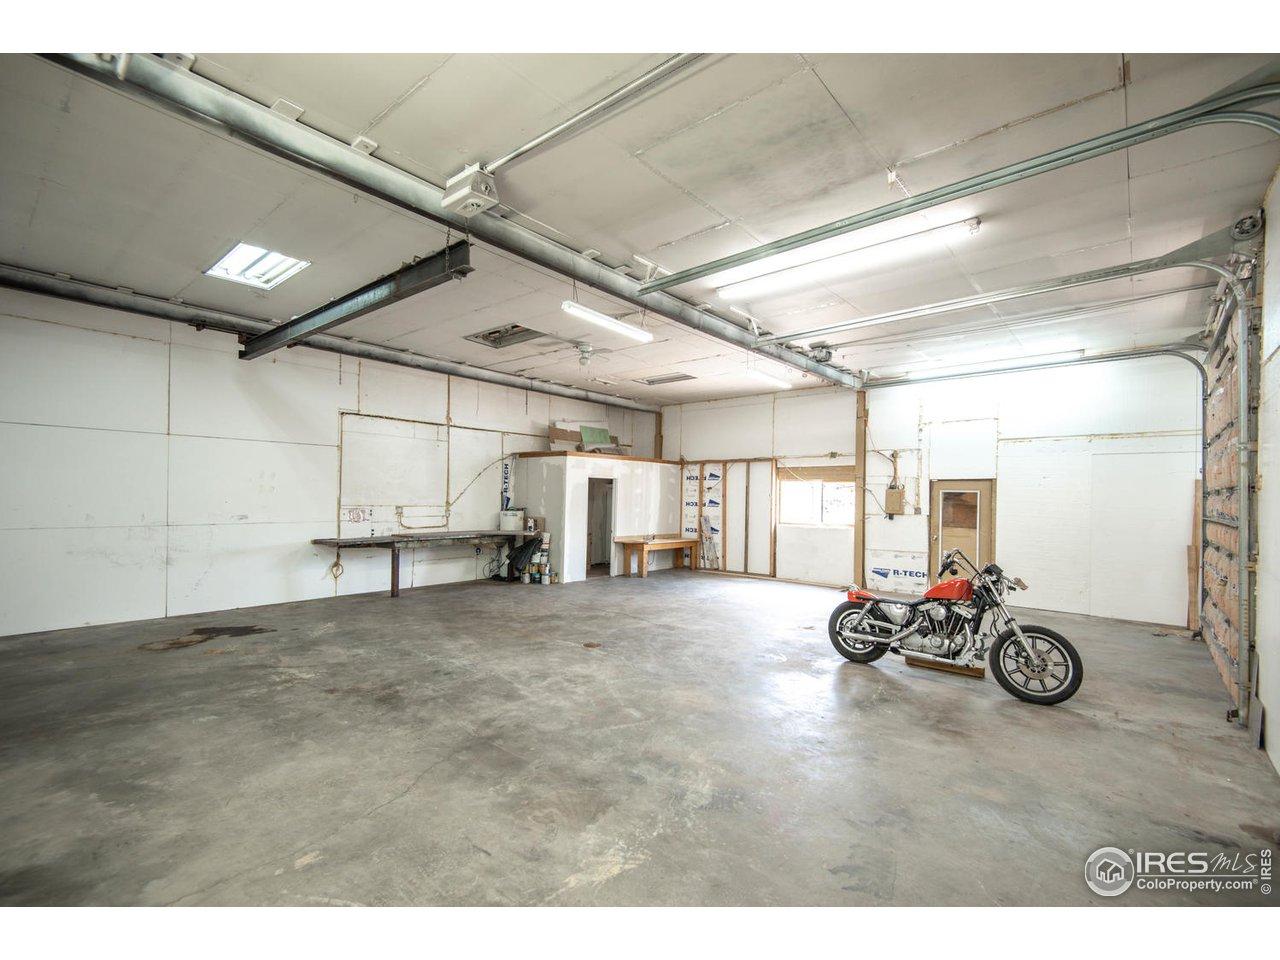 Garage/Shop East looking West